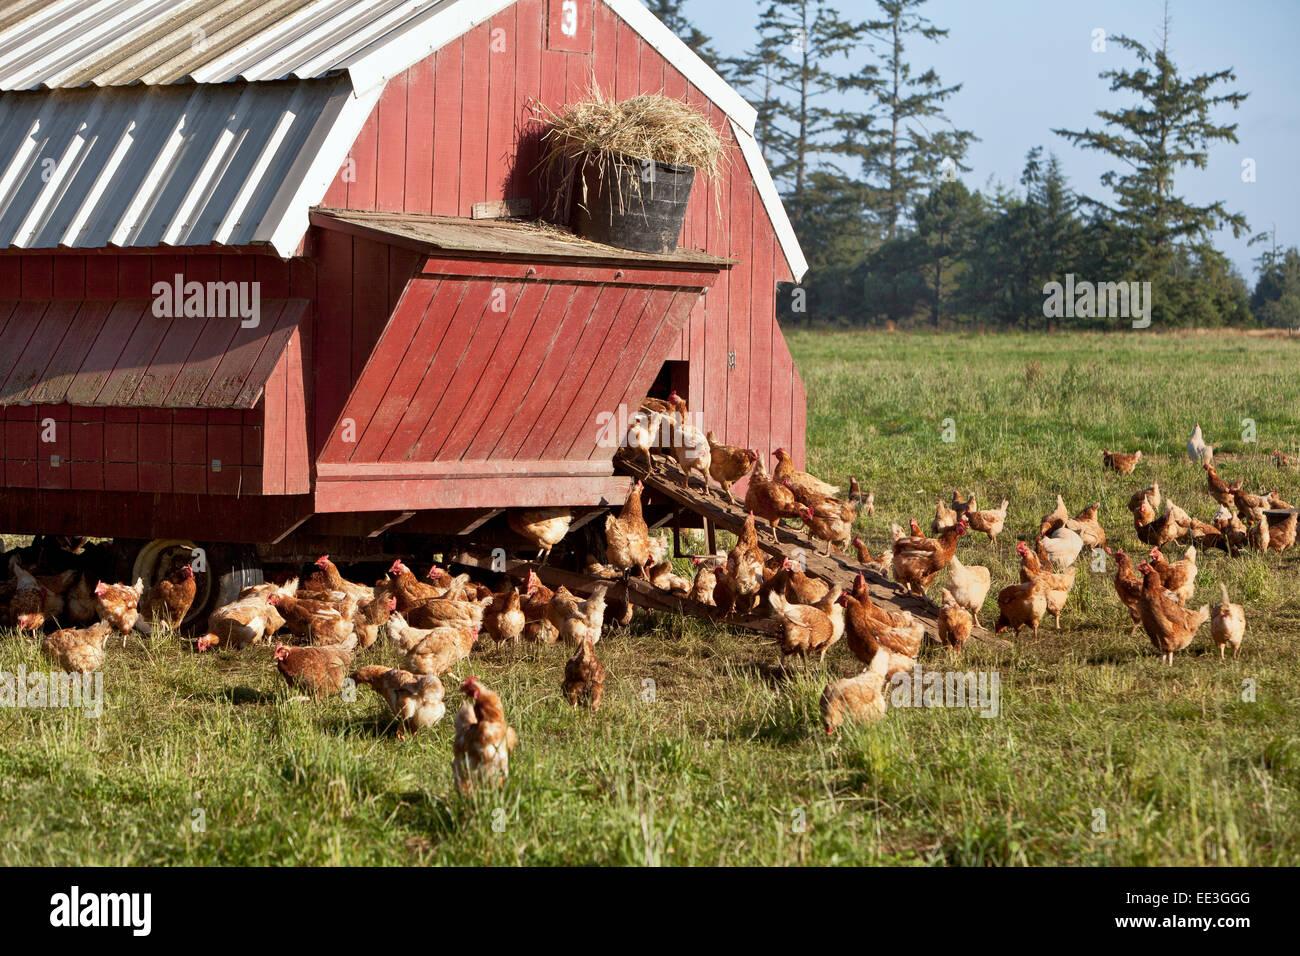 Free Range chickens, portable housing, free range,  'Gallus domesticus'. - Stock Image